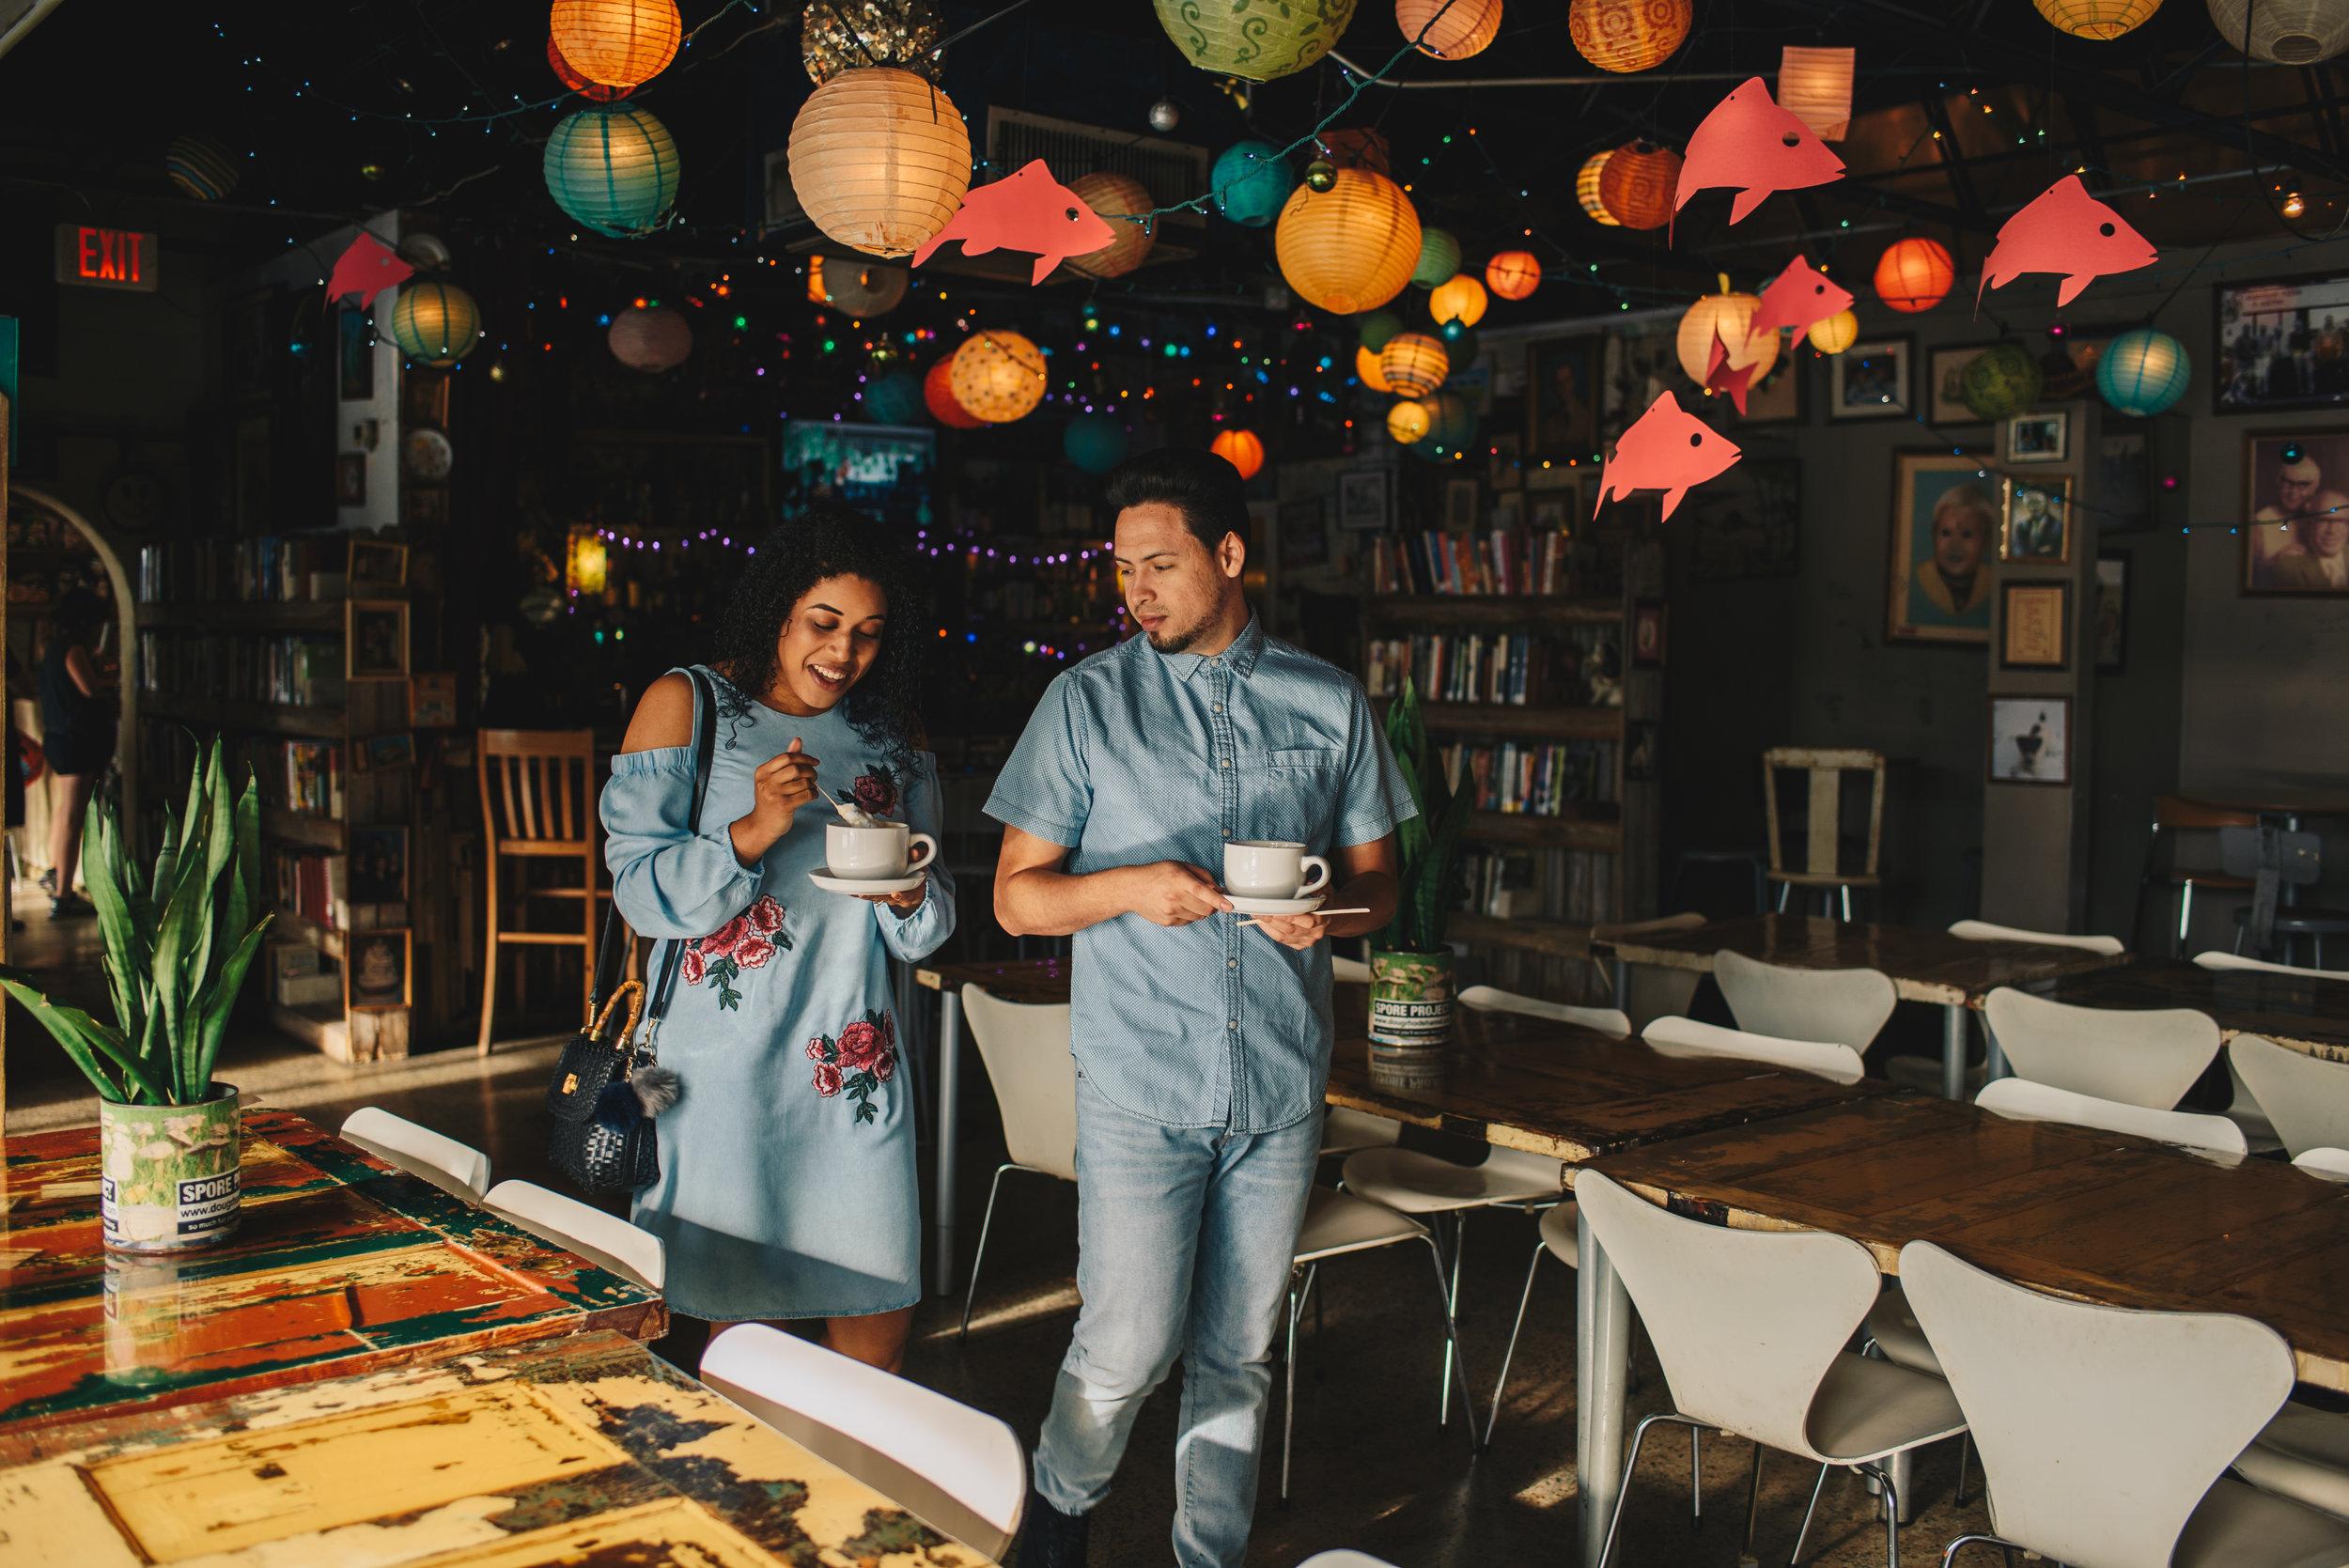 Los-Vargas-photo-coffee-shop-engagement-session-6.jpg